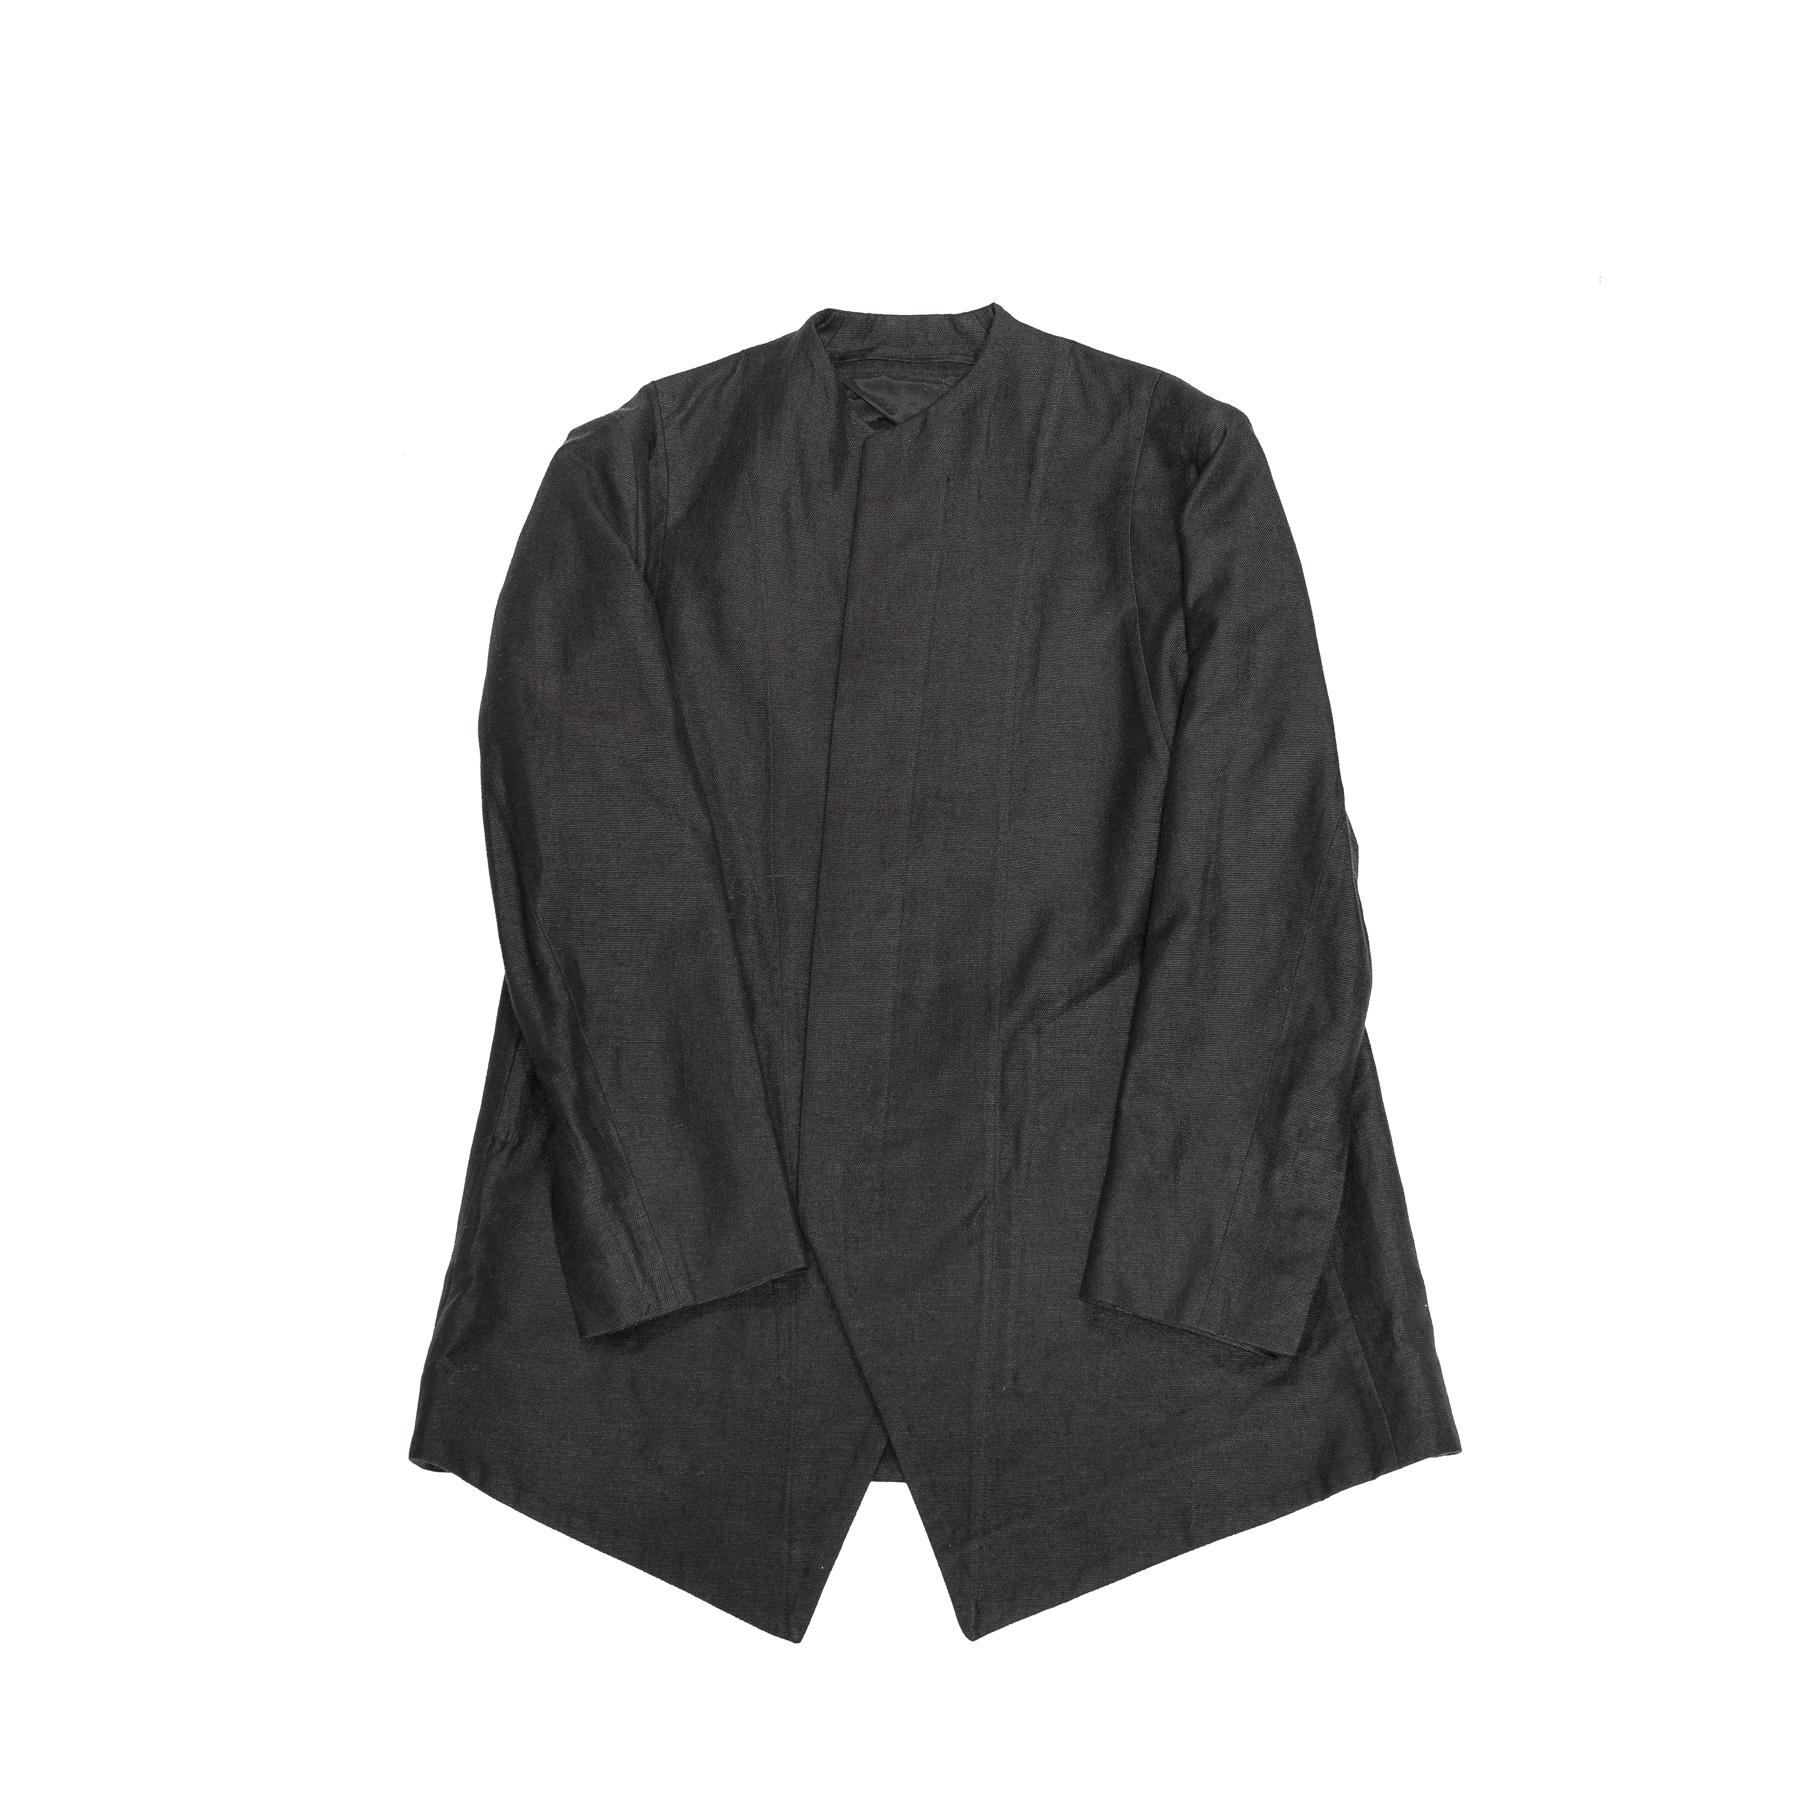 607JAM1-BLACK / エッジテーラードジャケット